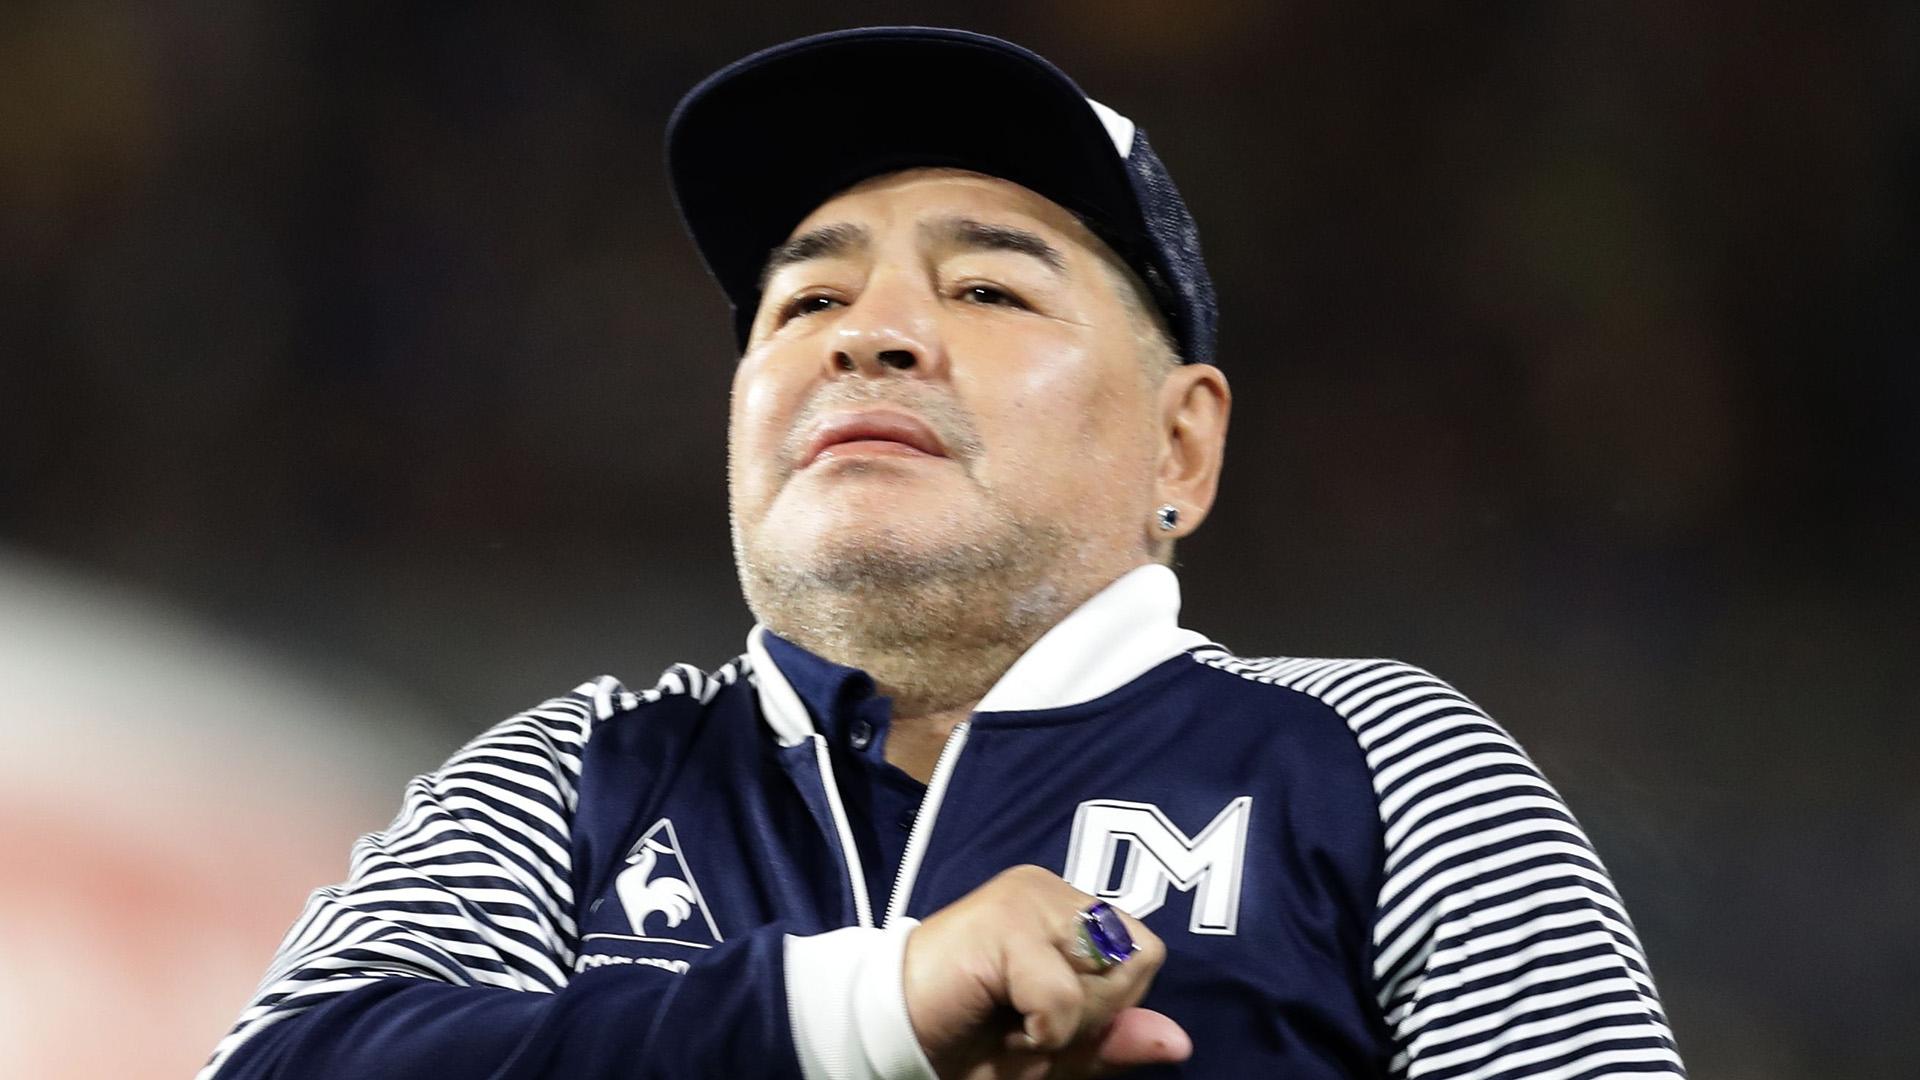 Diego Maradona was the godfather of football - Kaizer Chiefs legend Khumalo remembers Argentina stint